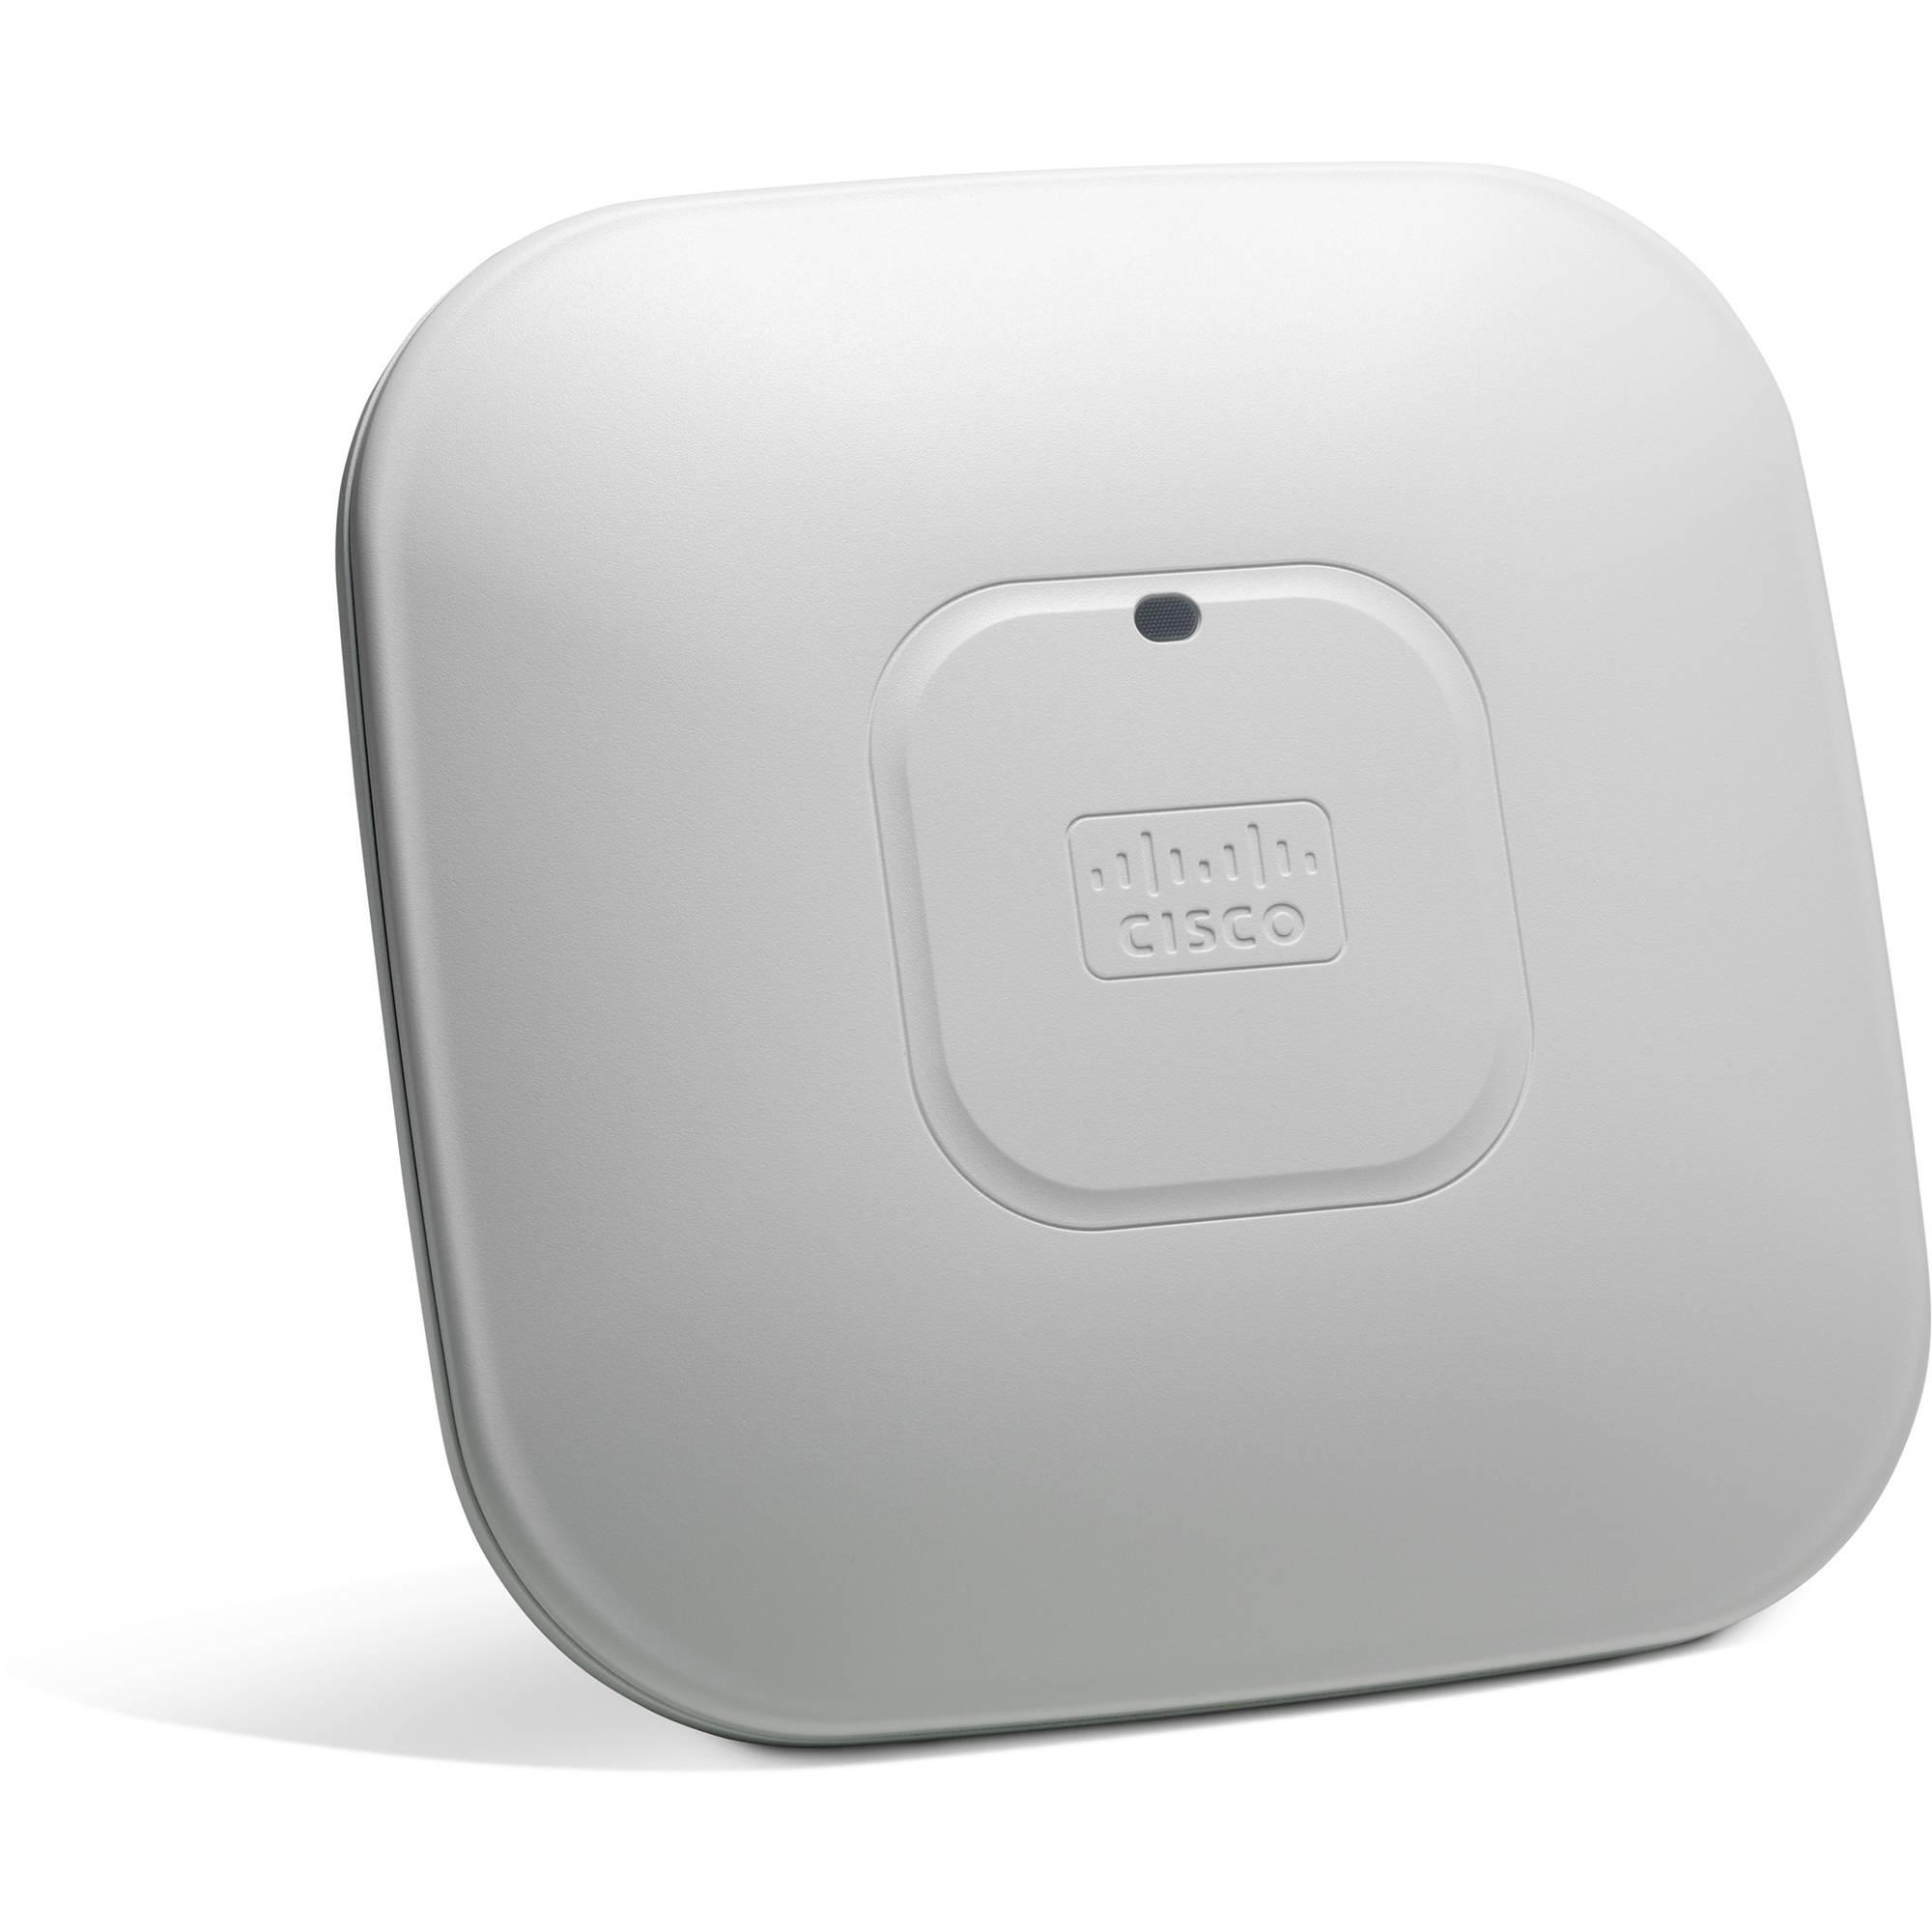 cisco 2600 access point firmware update